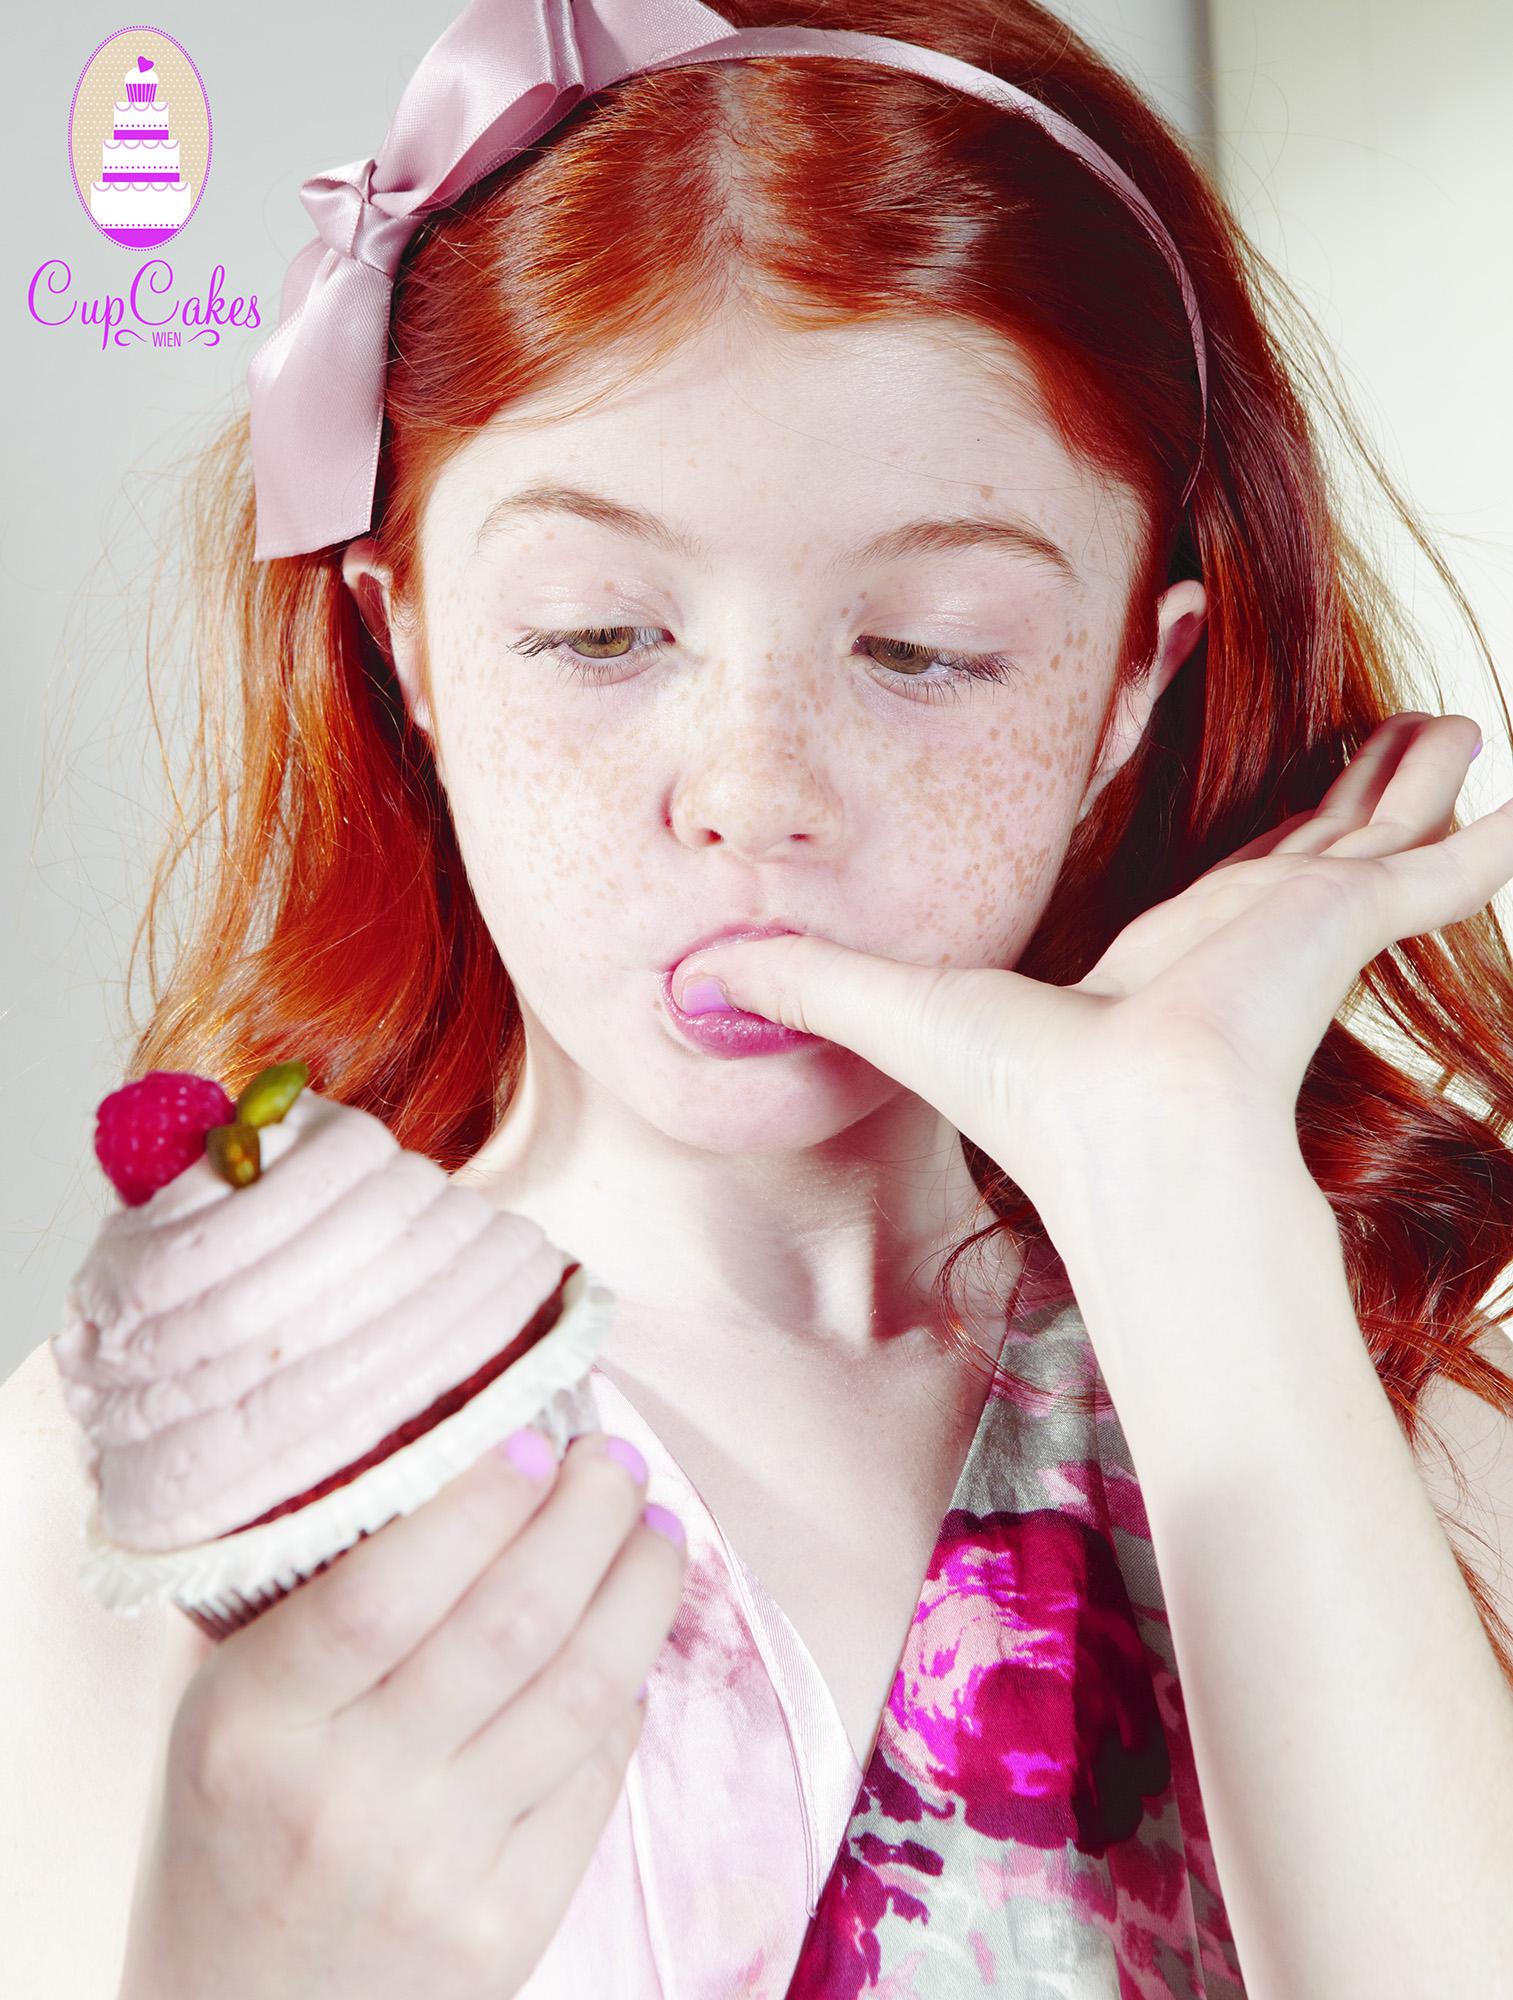 Ilve Little girl eating cupcake